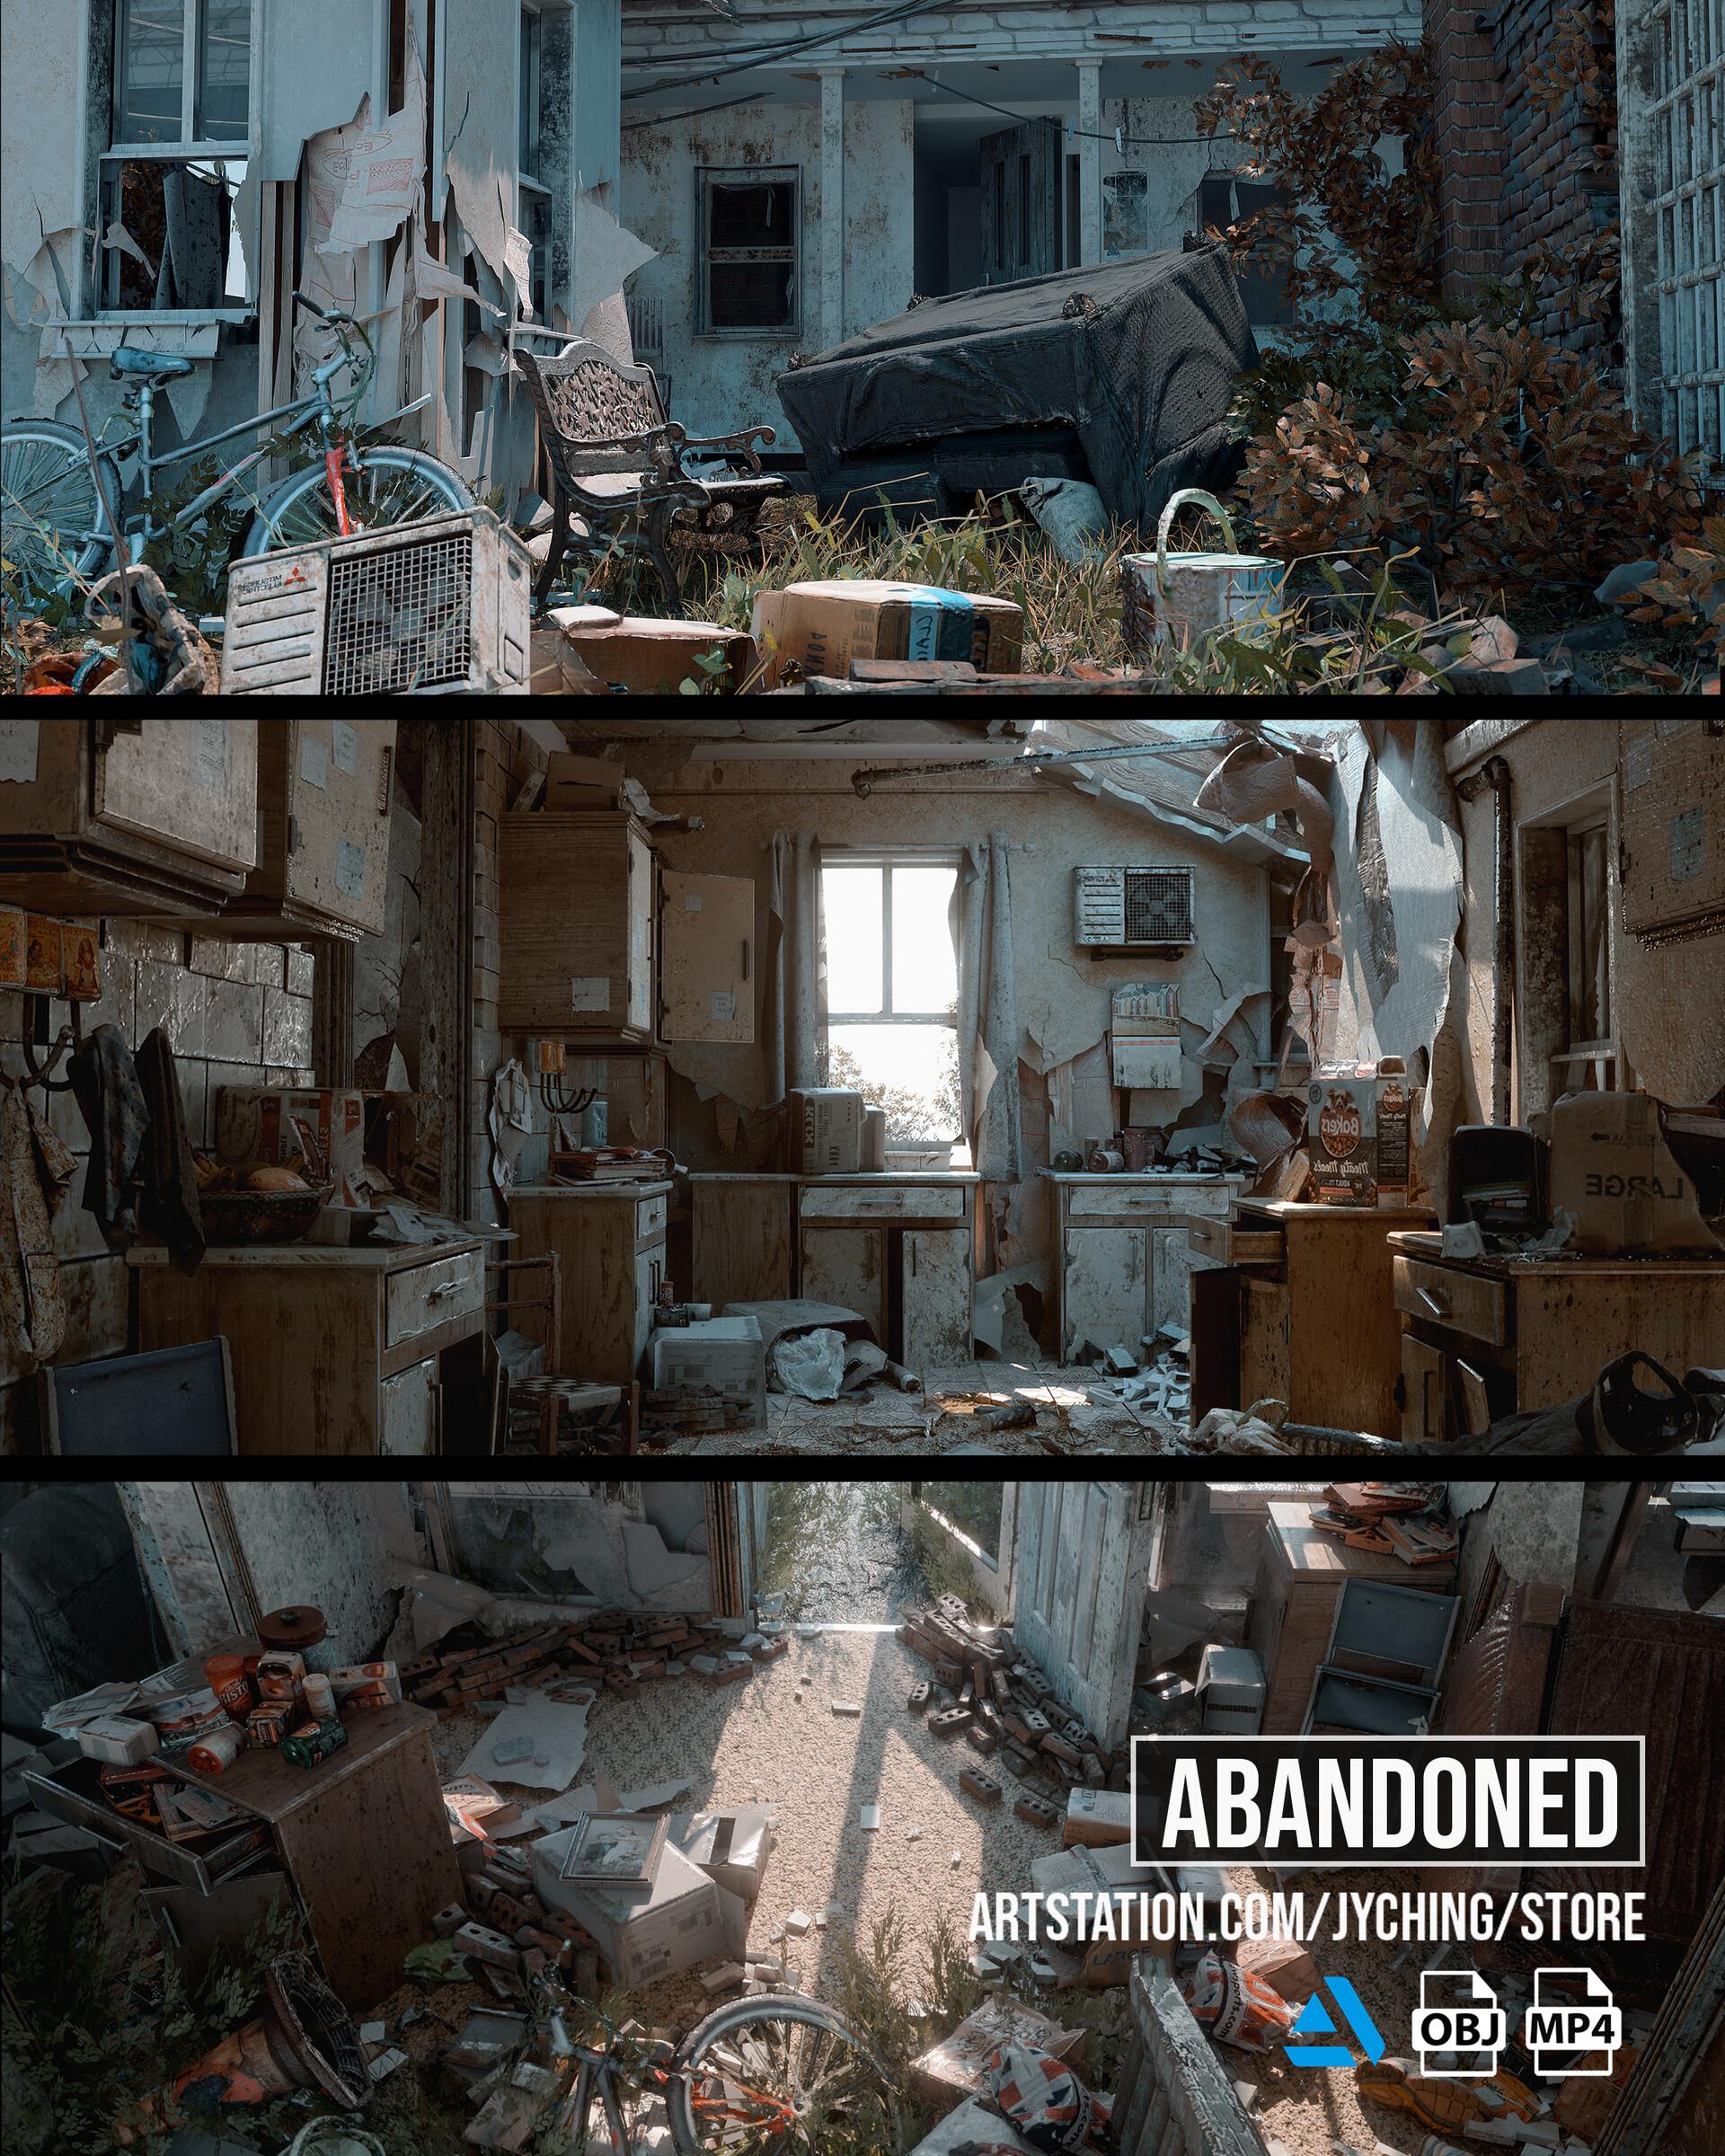 Jonathan ching abandoned poster 01